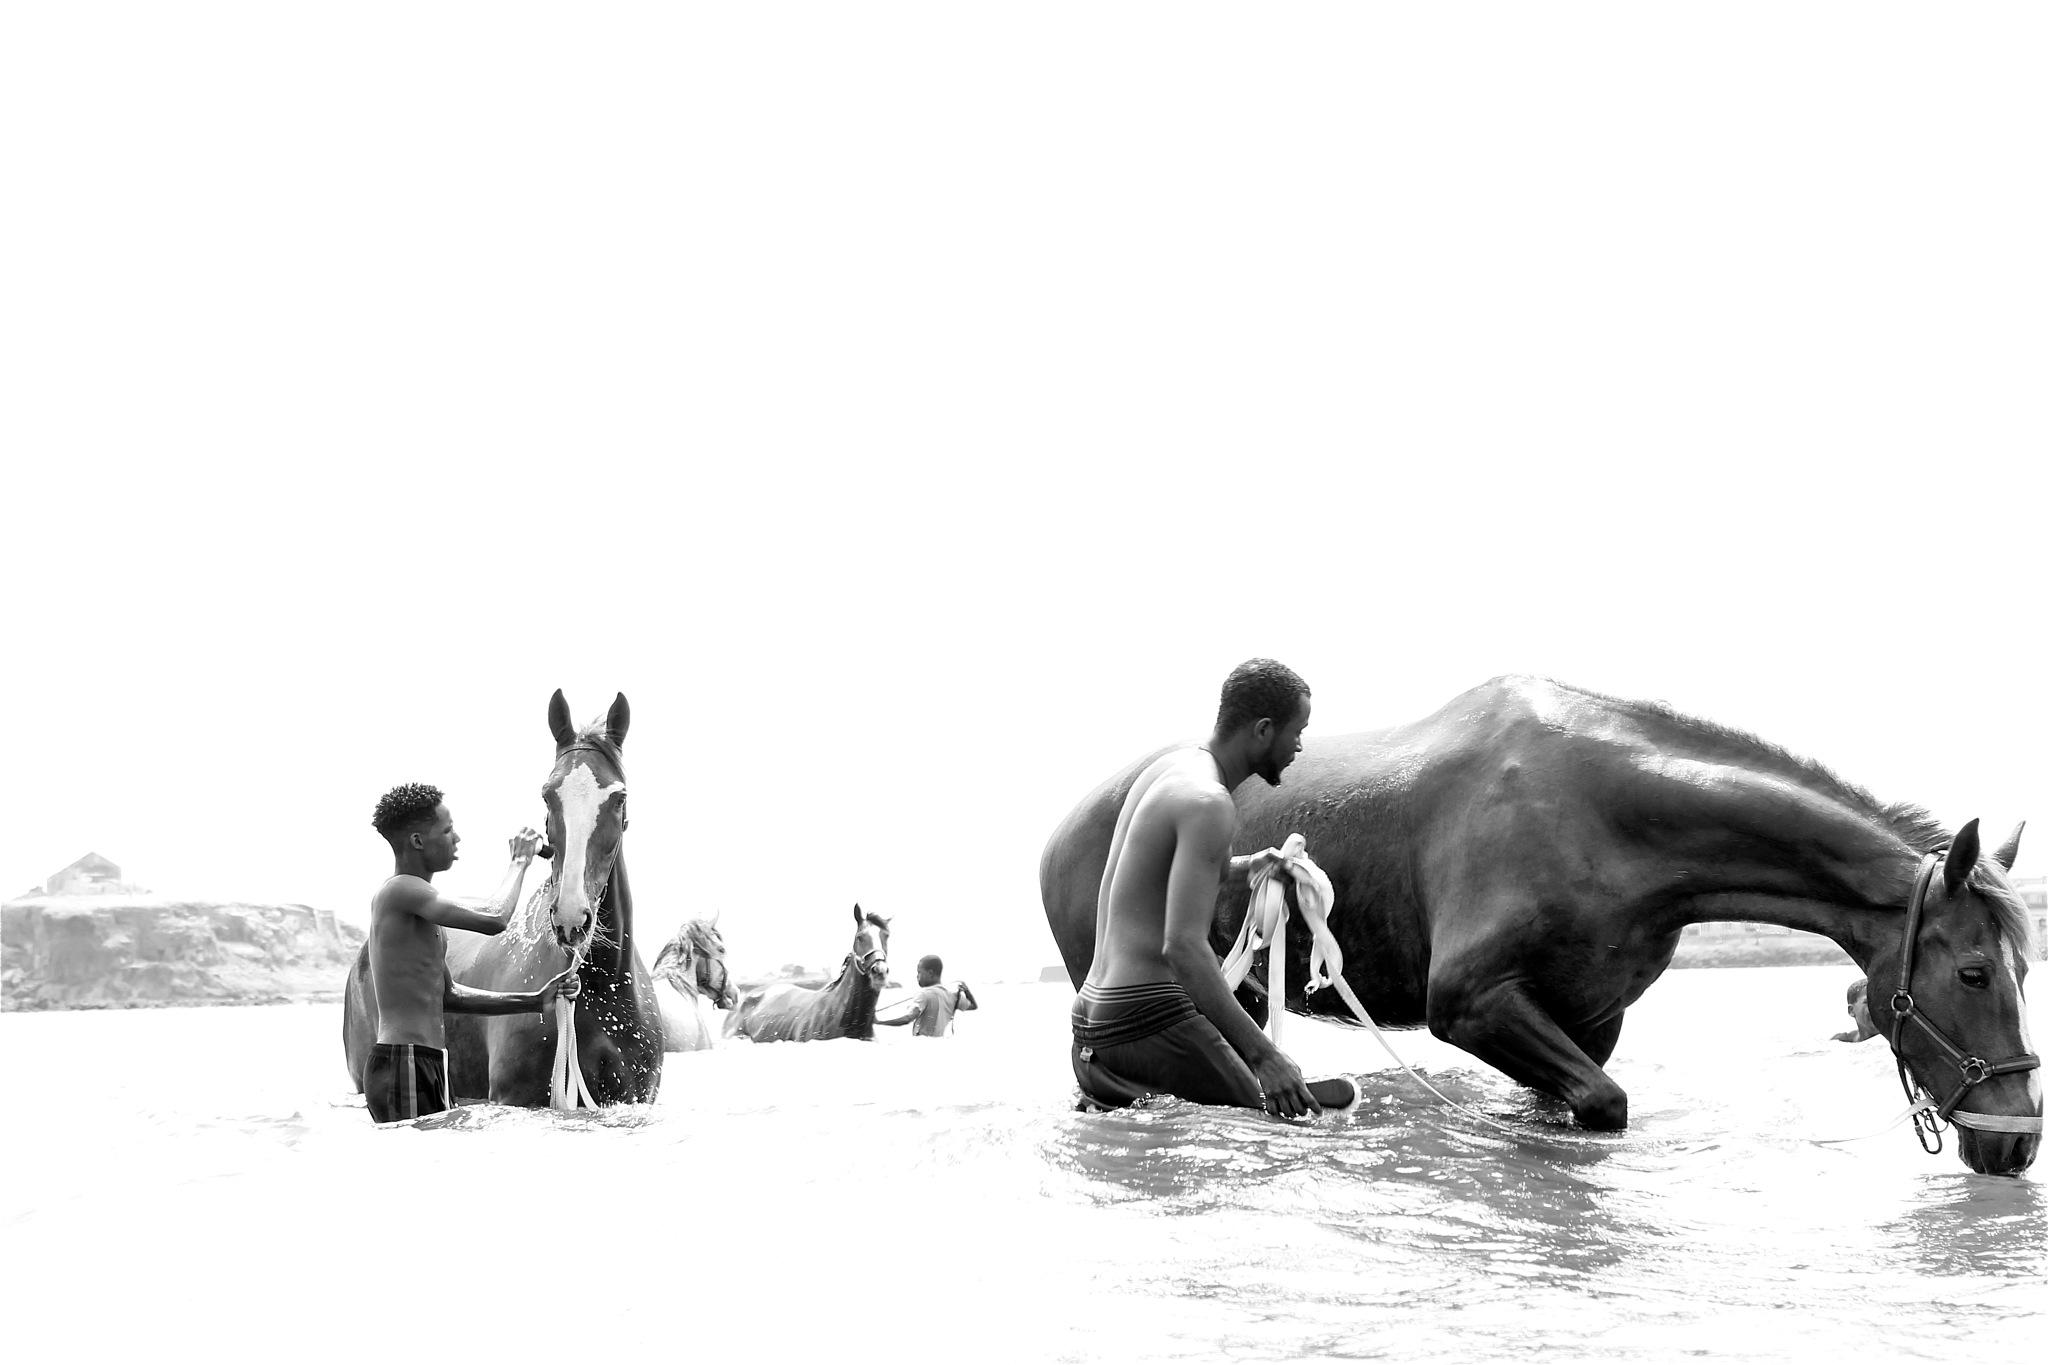 INTELI(GENTES) ANIMAIS #24 by H. Paz Monteiro